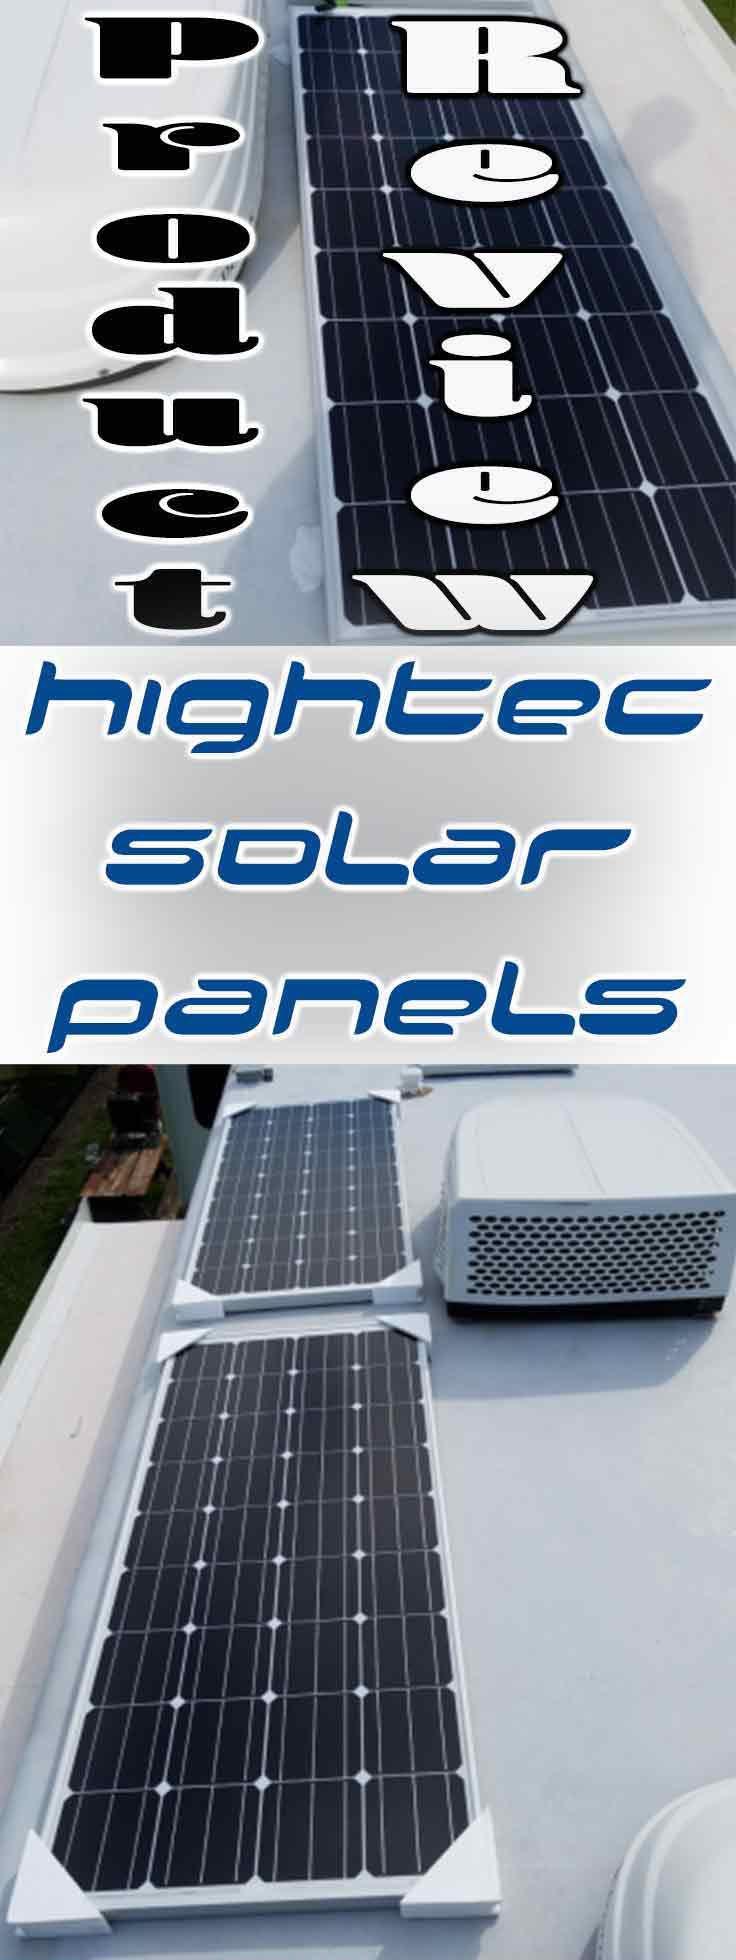 Always On Liberty Review HIGHTEC Solar Panels   Heartland RV Blog